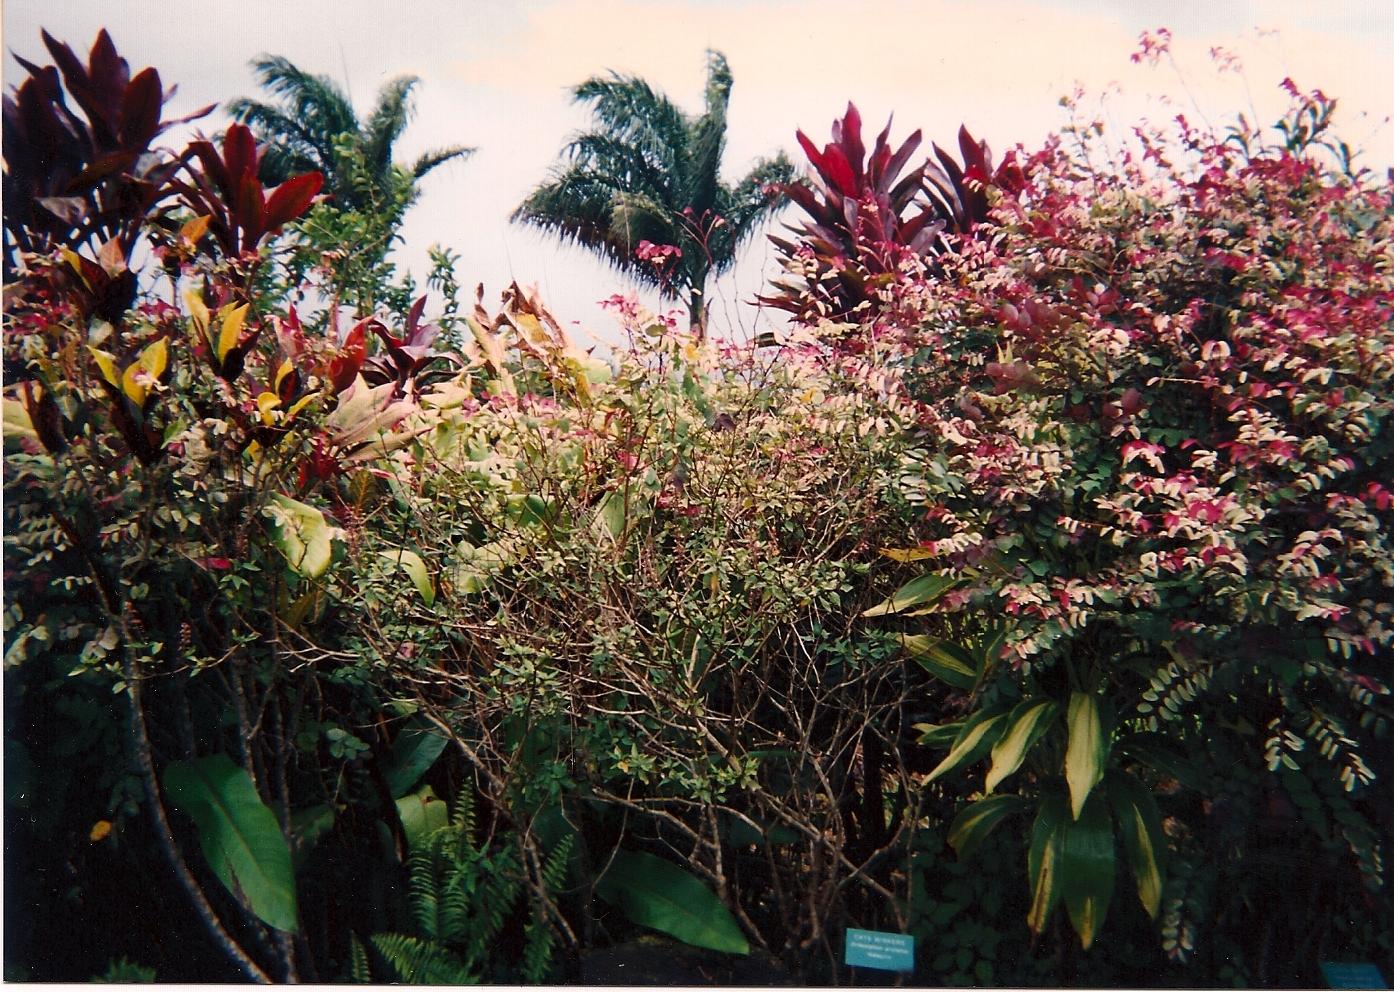 Garden of eden beautiful photographs for Jardin of eden